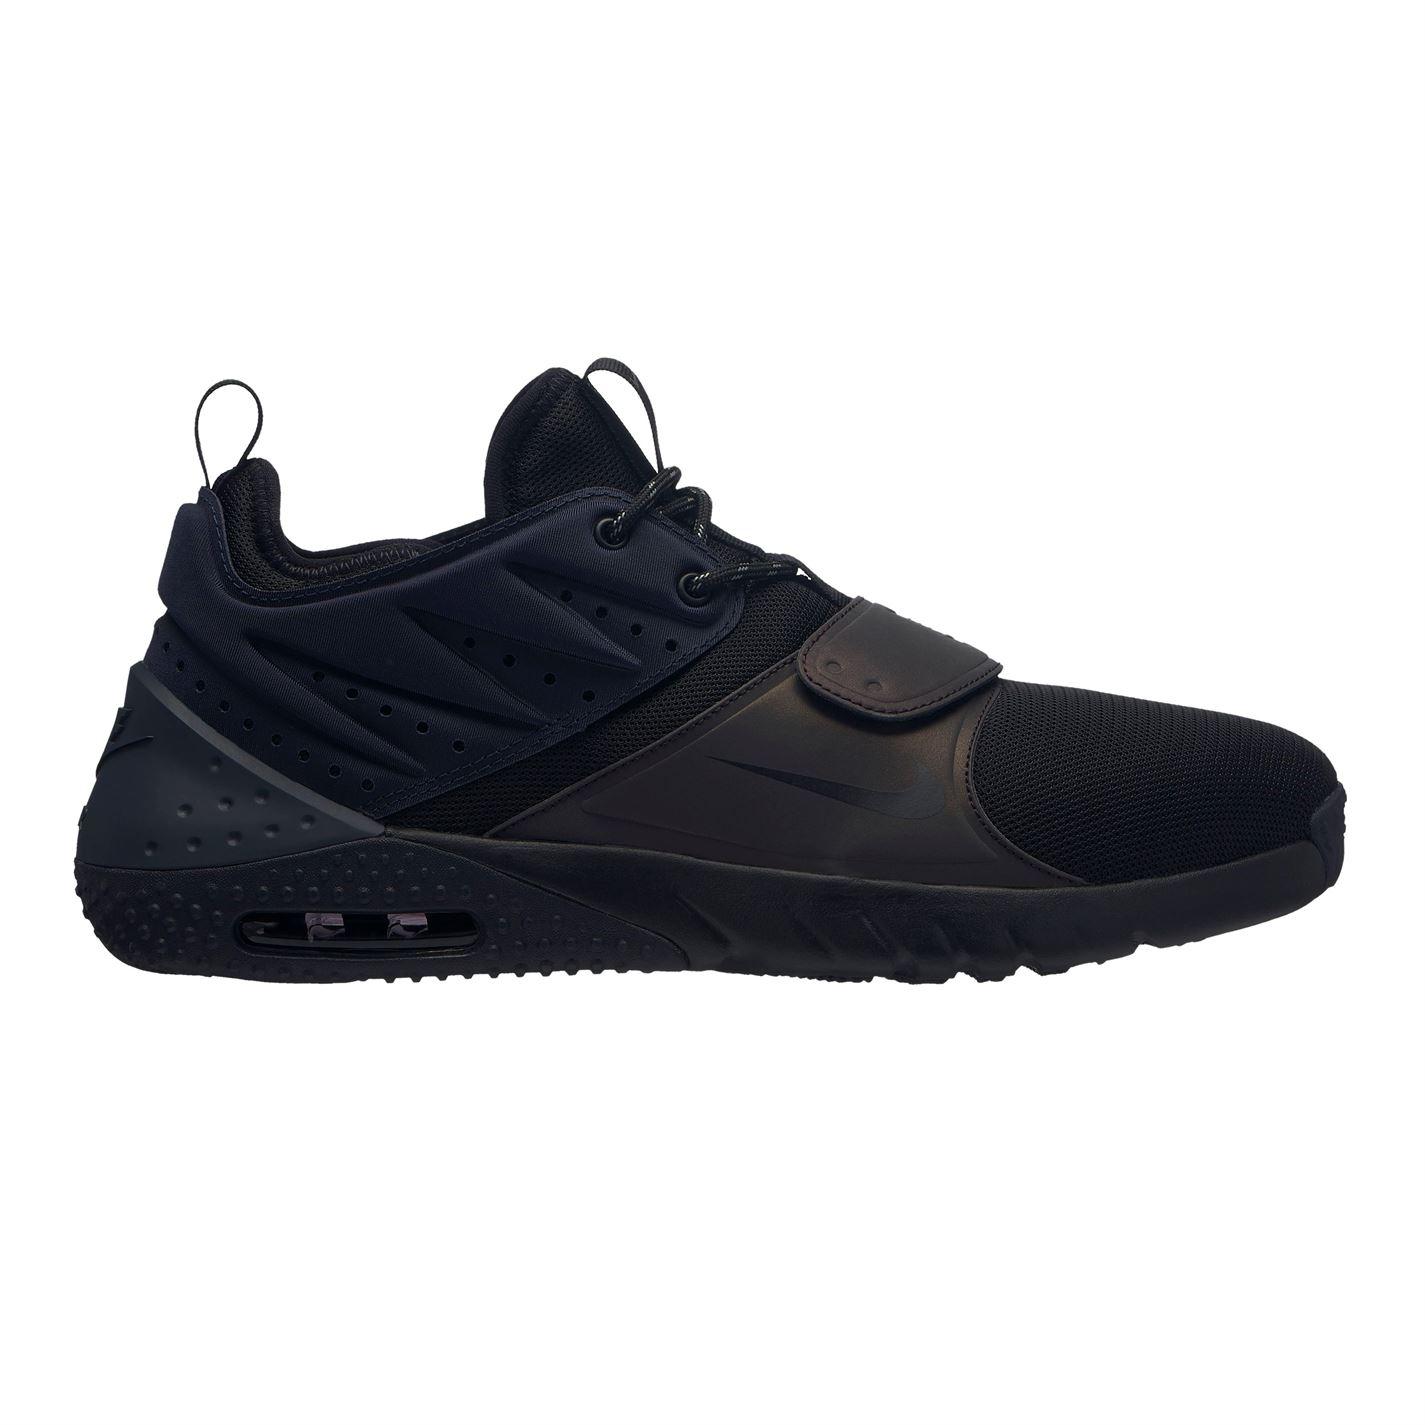 boty Nike Dual Fusion II pánské Training Shoes Black Blk Navy. boty Nike  Dual Fusion II pánské Training Shoes ... 29c9d3c8c09